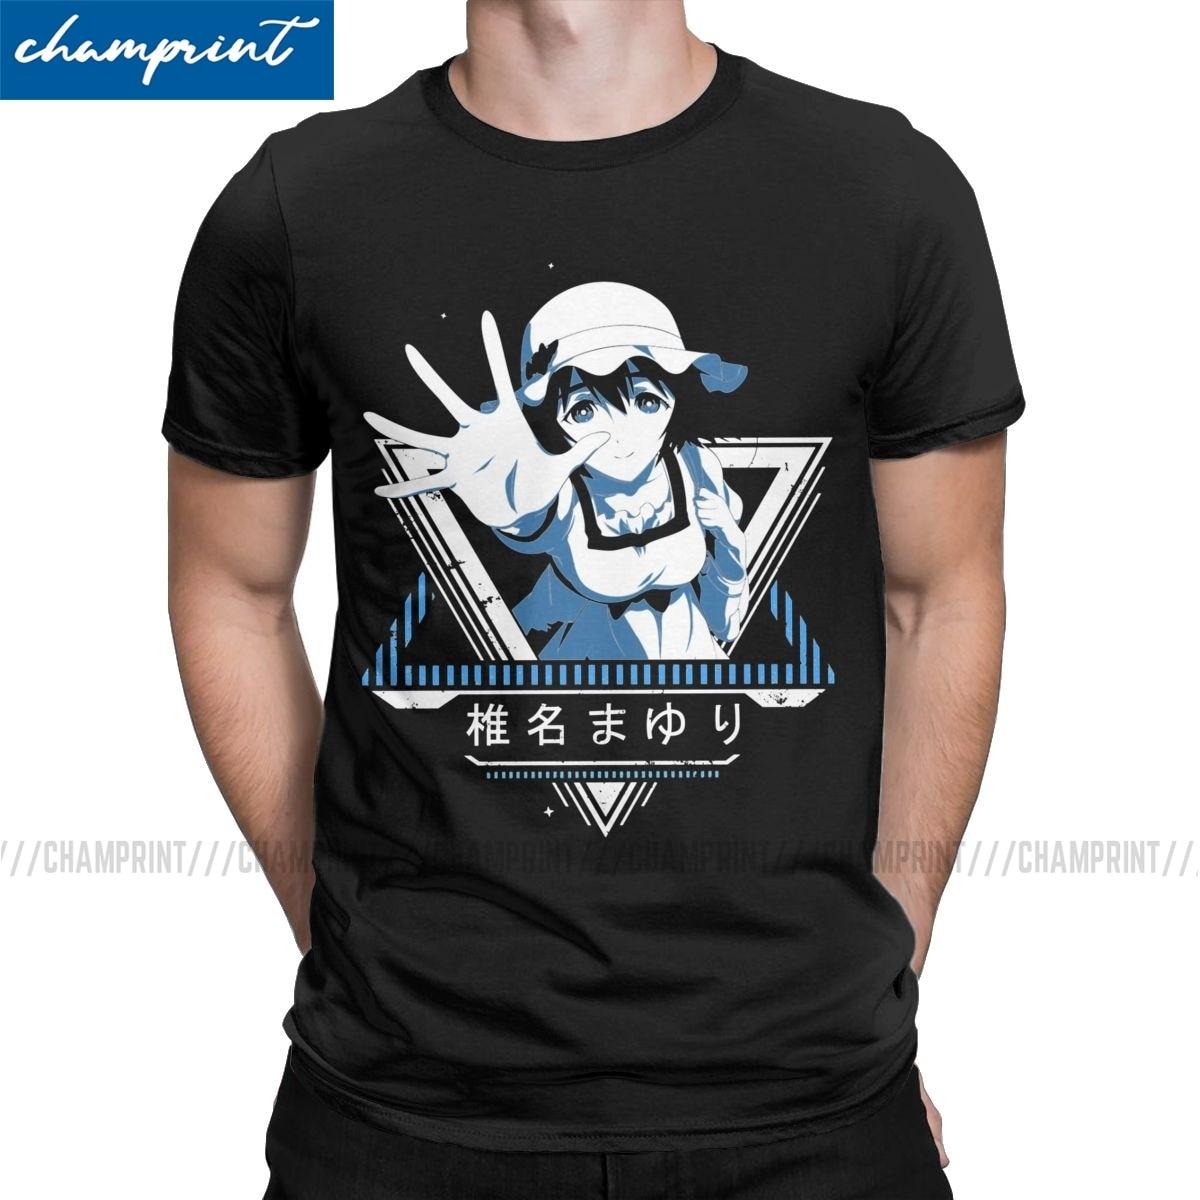 Mayuri Star Steins Gate Anime T Shirts Men Cotton Creative T-Shirts Round Collar Okabe Kurisu Tees Short Sleeve Tops Printed